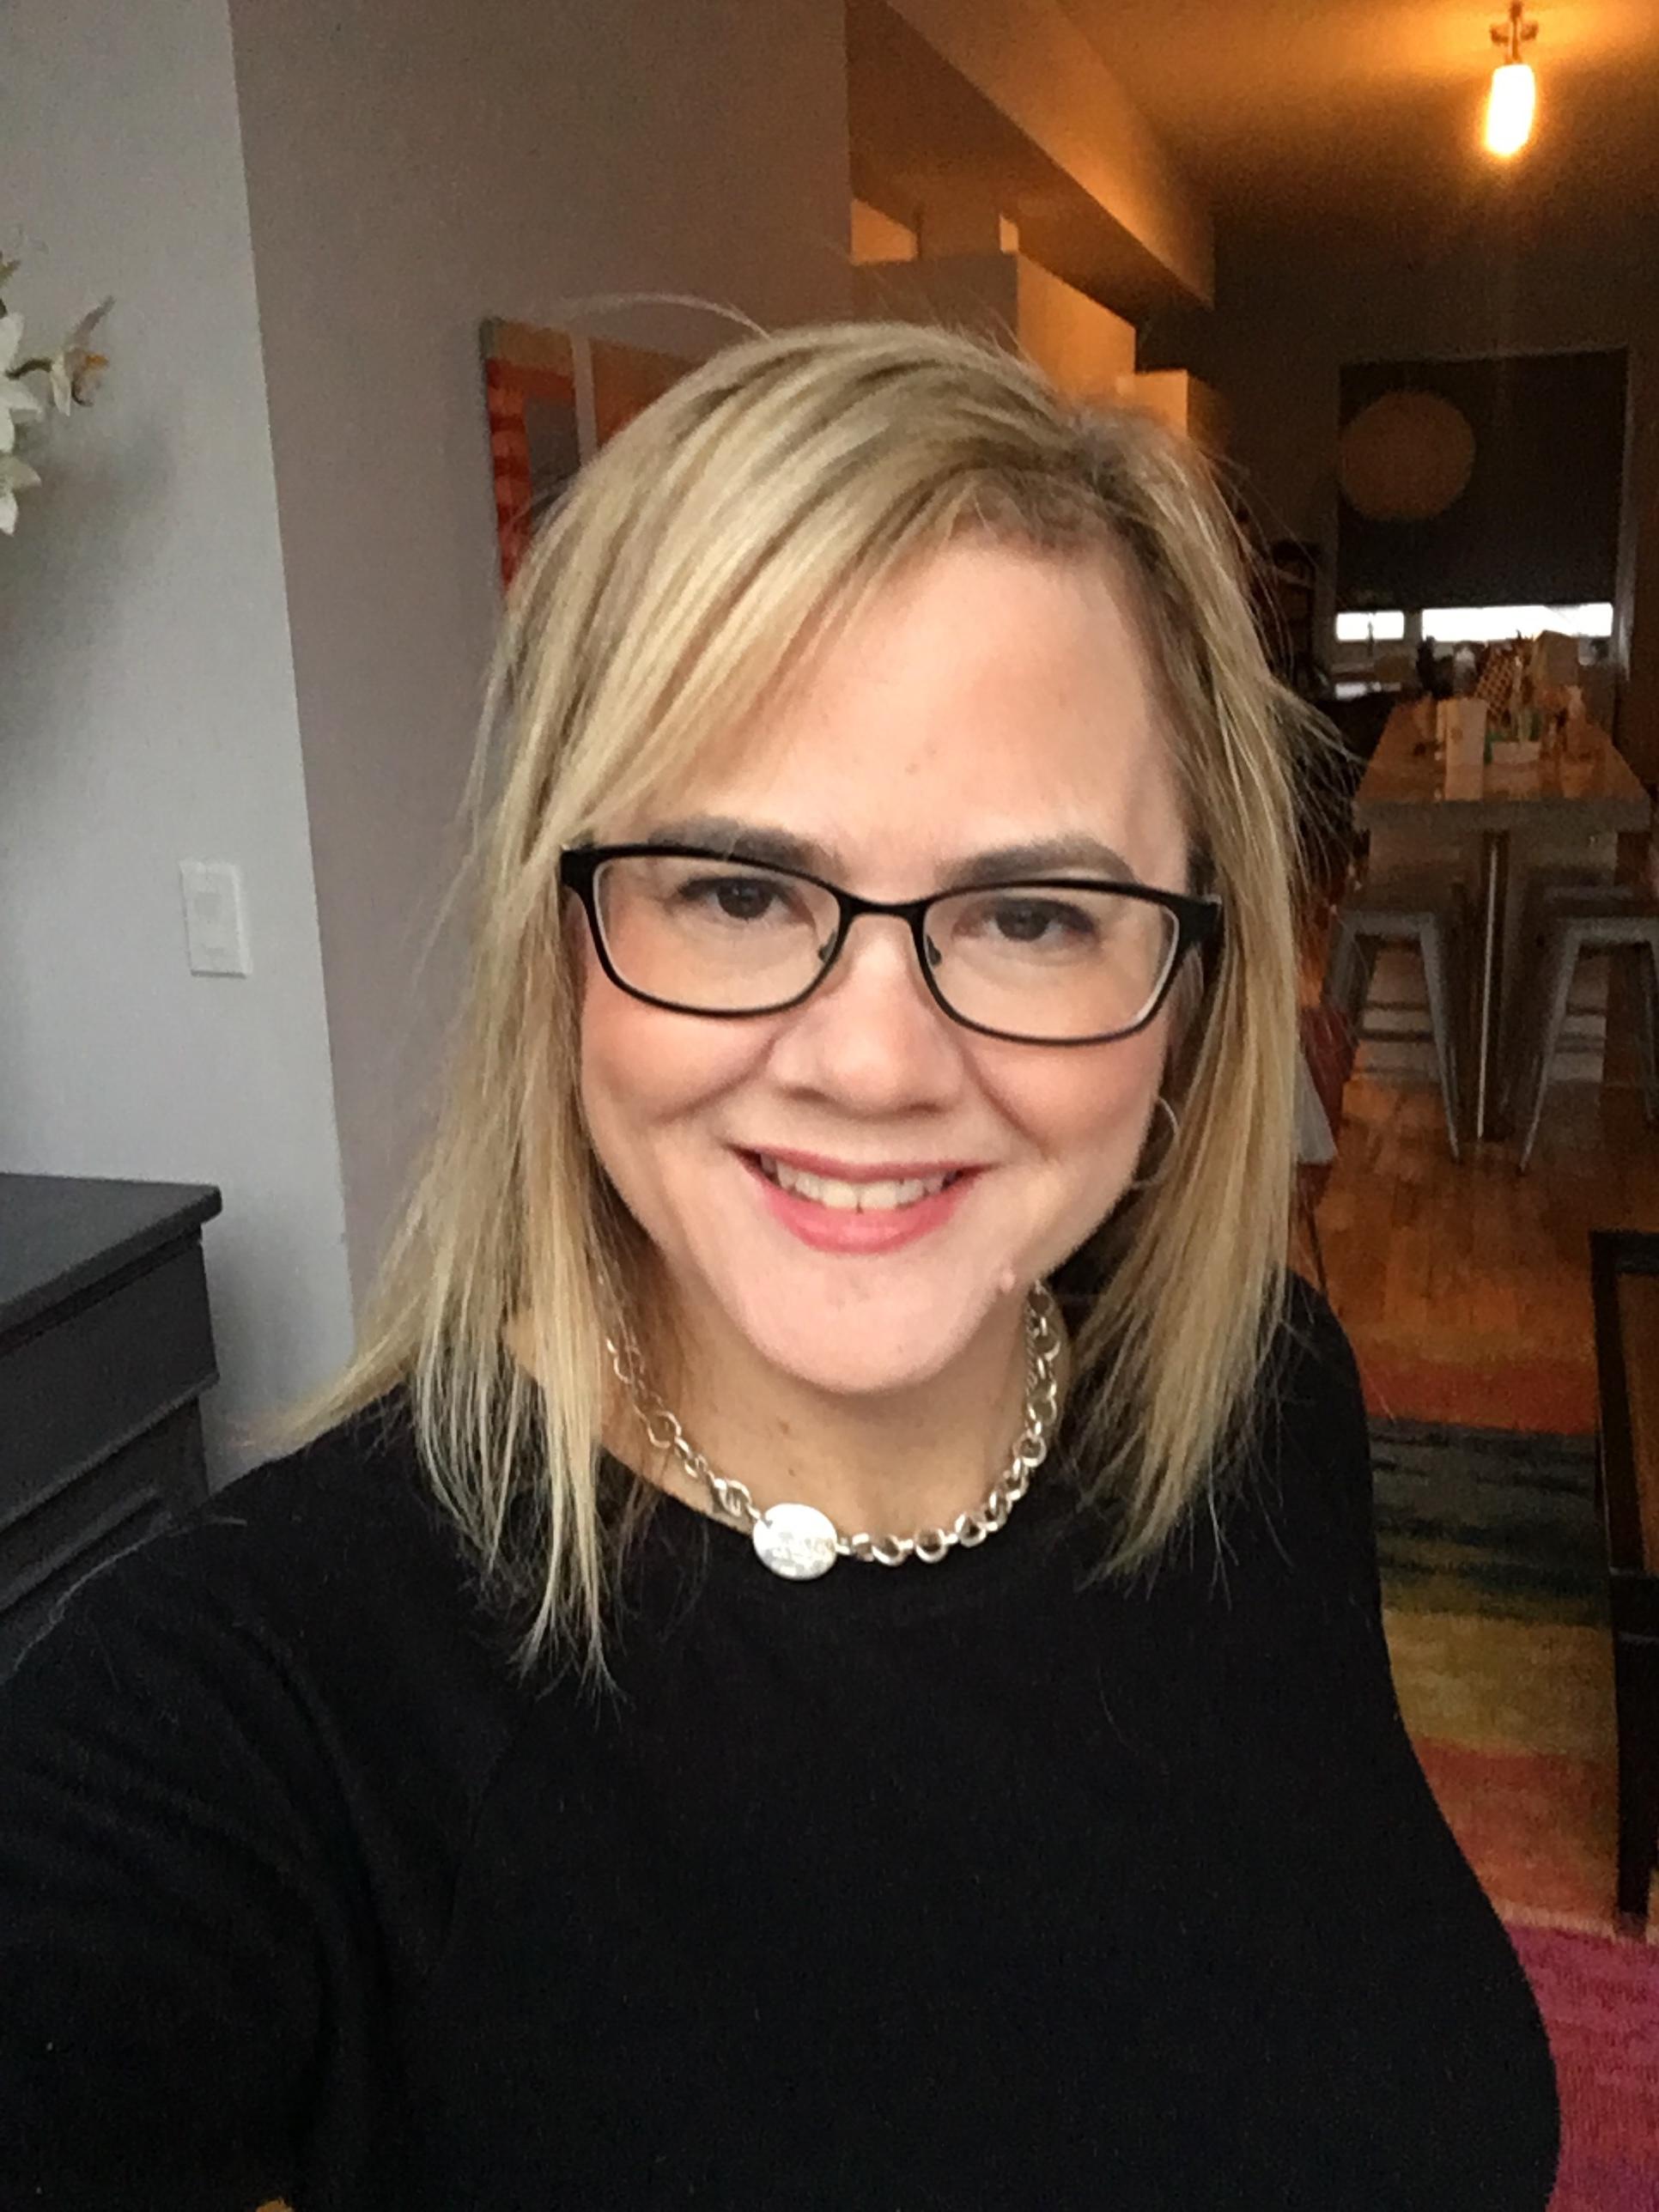 Suzy Life Begins At 50 Toronto On Meetup